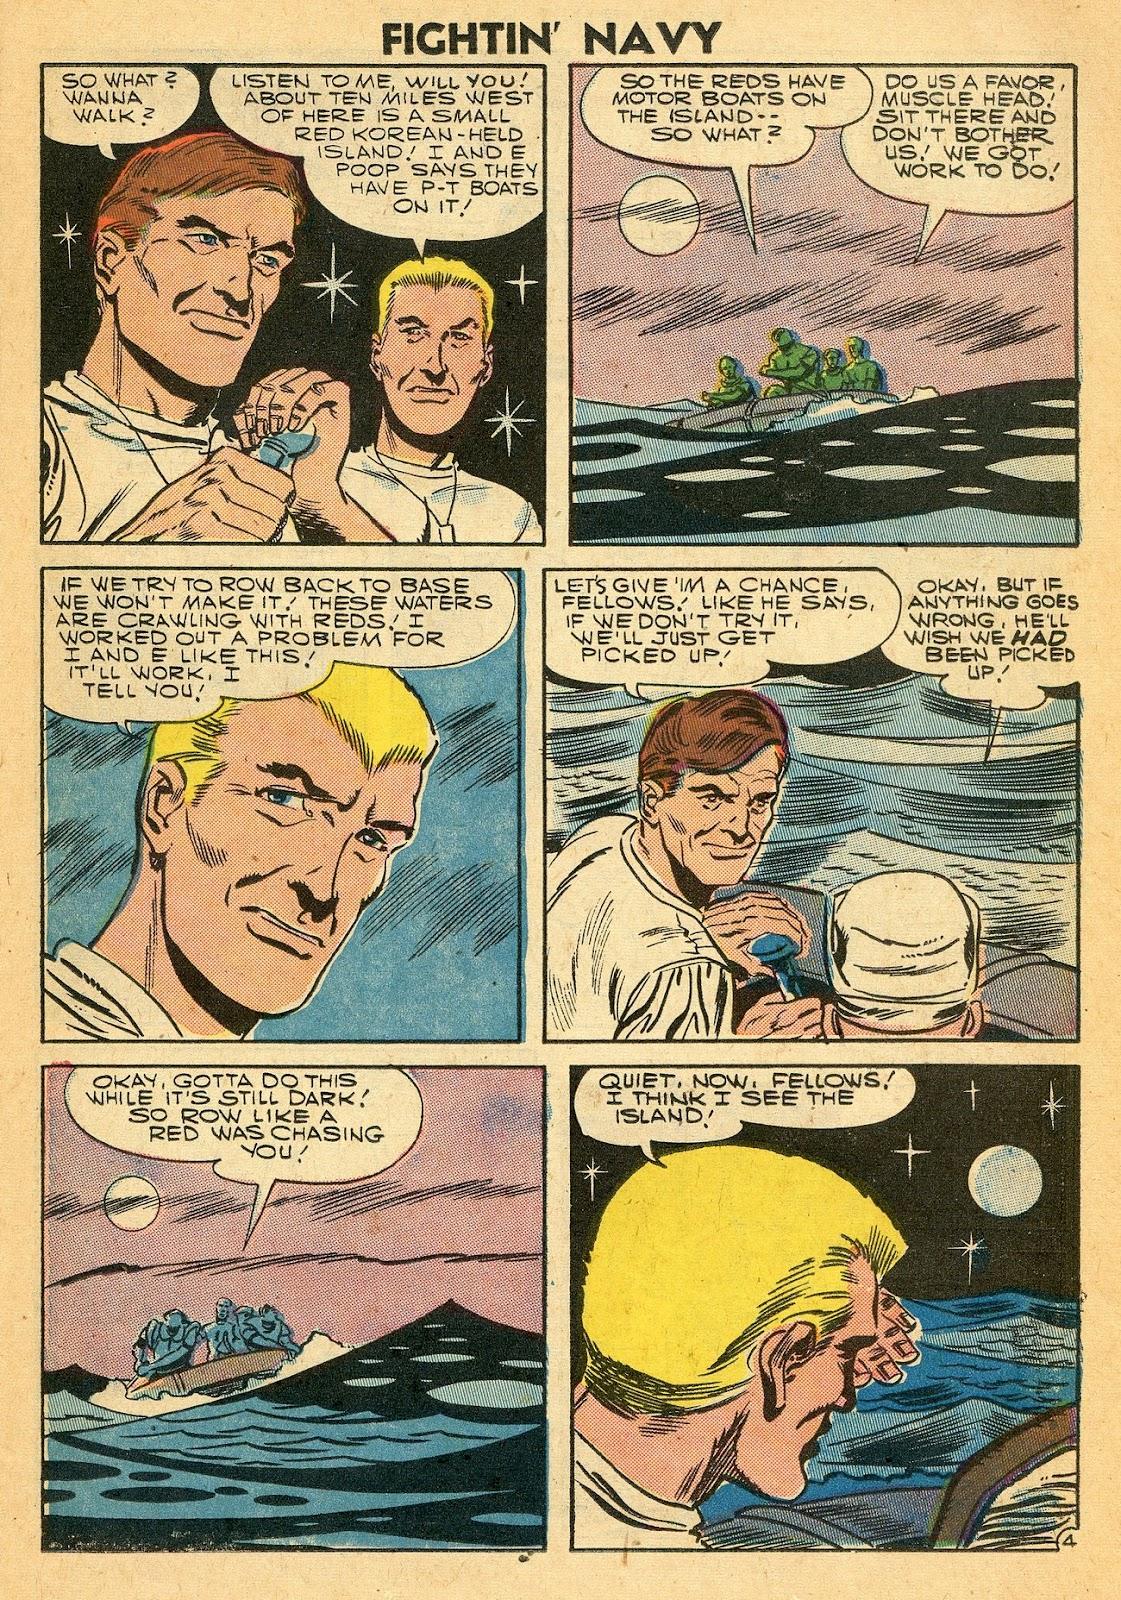 Read online Fightin' Navy comic -  Issue #77 - 23